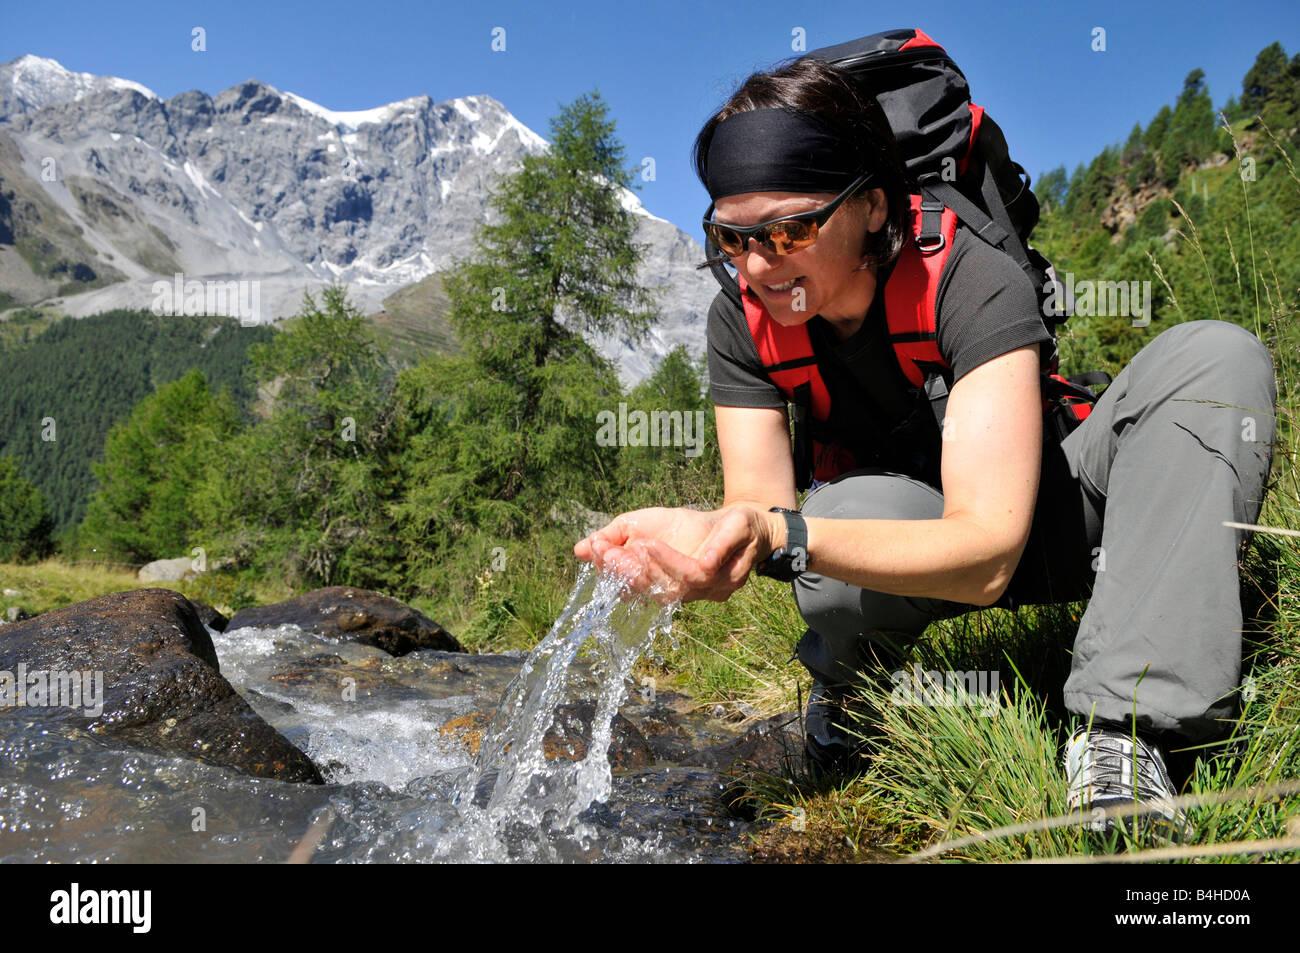 Female hiker drinking water from creek, Trentino-Alto Adige, Italy - Stock Image